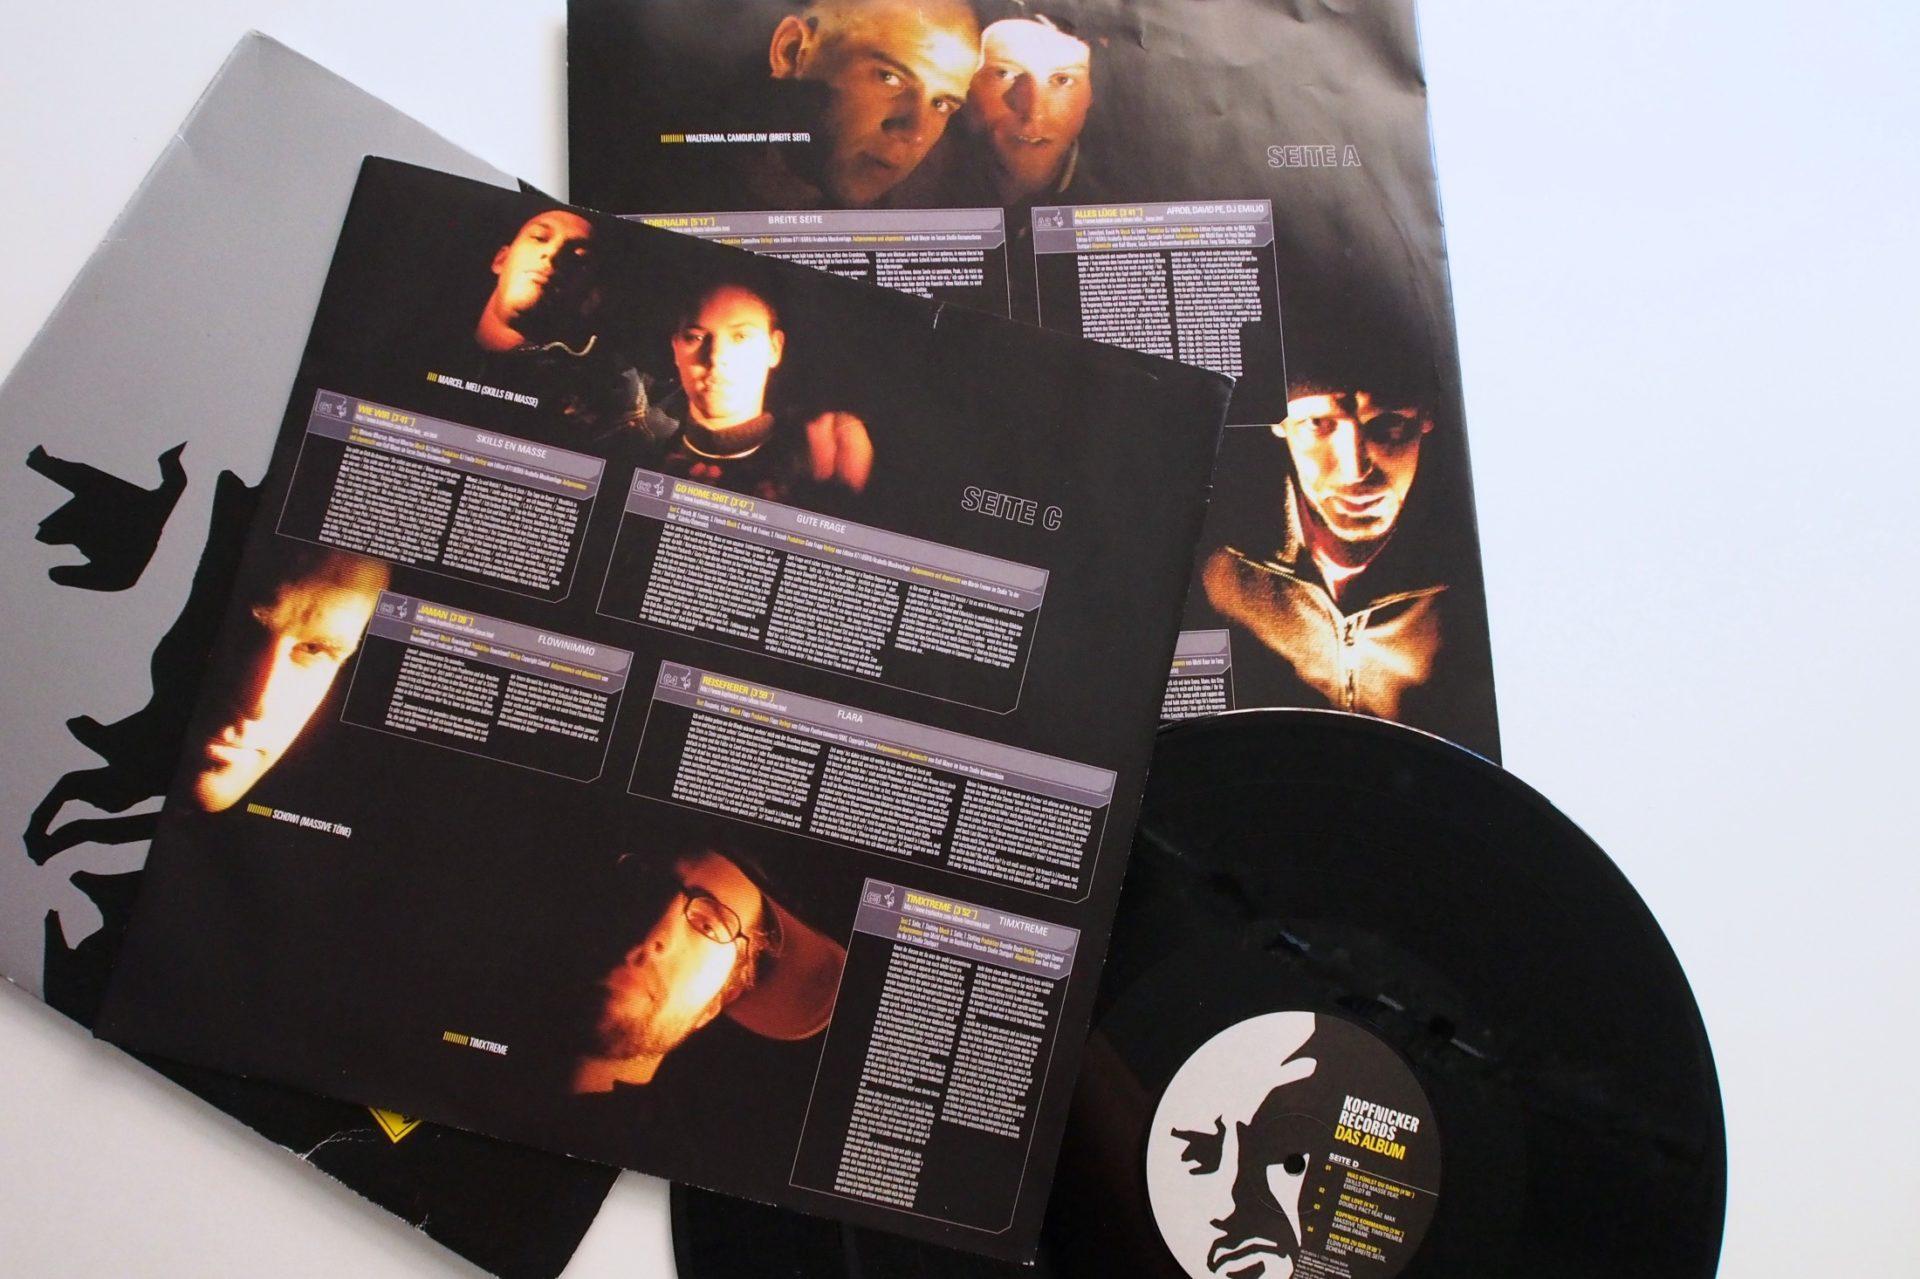 Kopfnicker Records